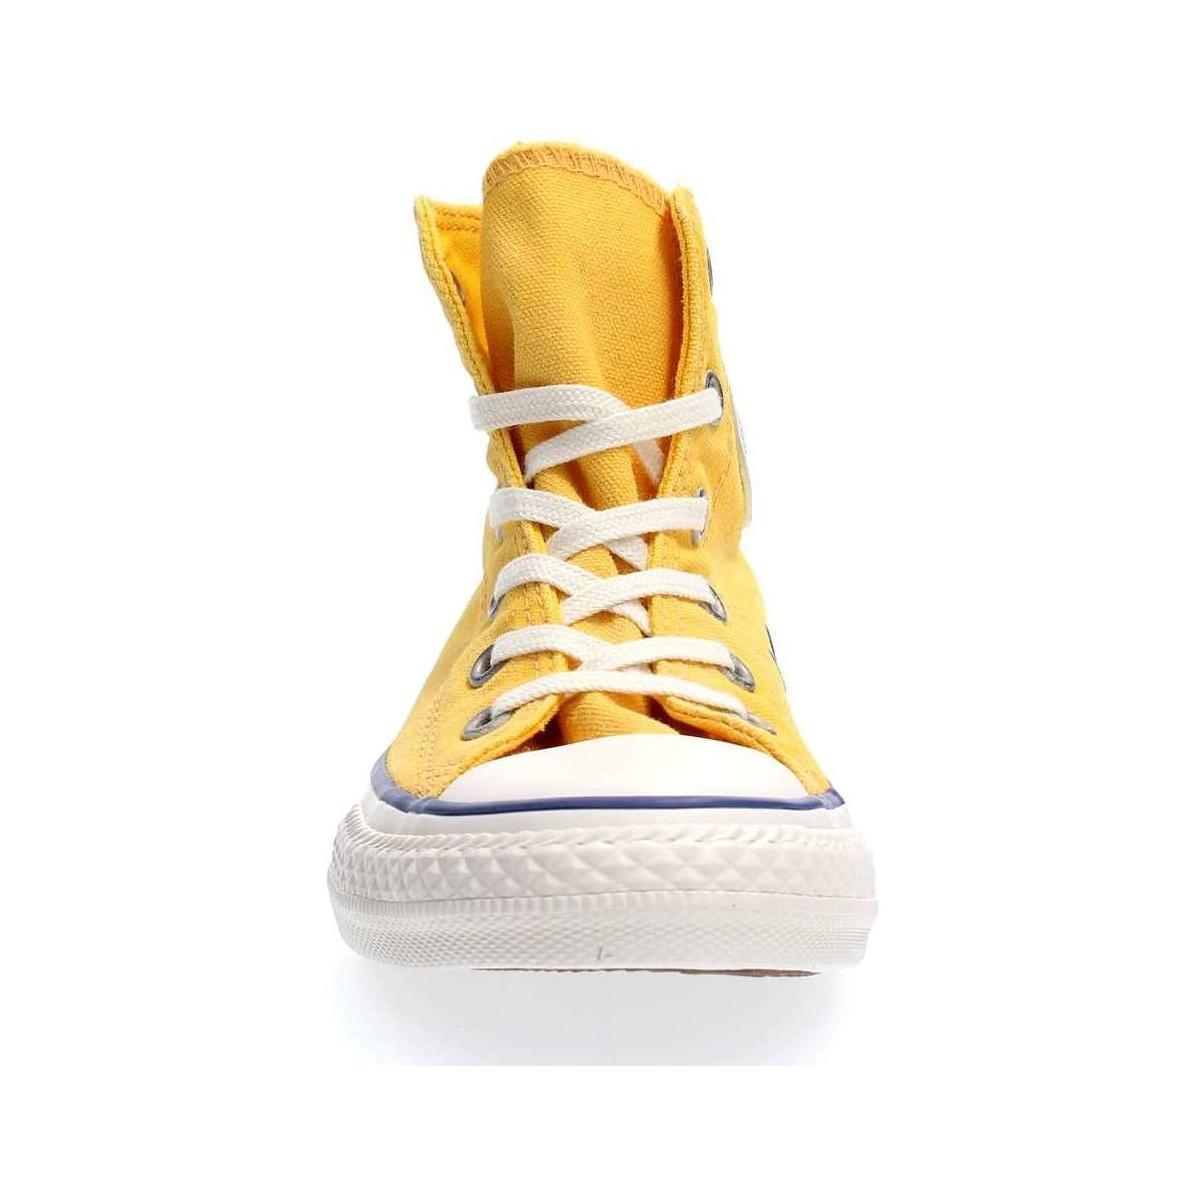 Lyst Chuck Taylor En Converse Femmes Chaussures Hi 661014c Jaune rHxfwqTr